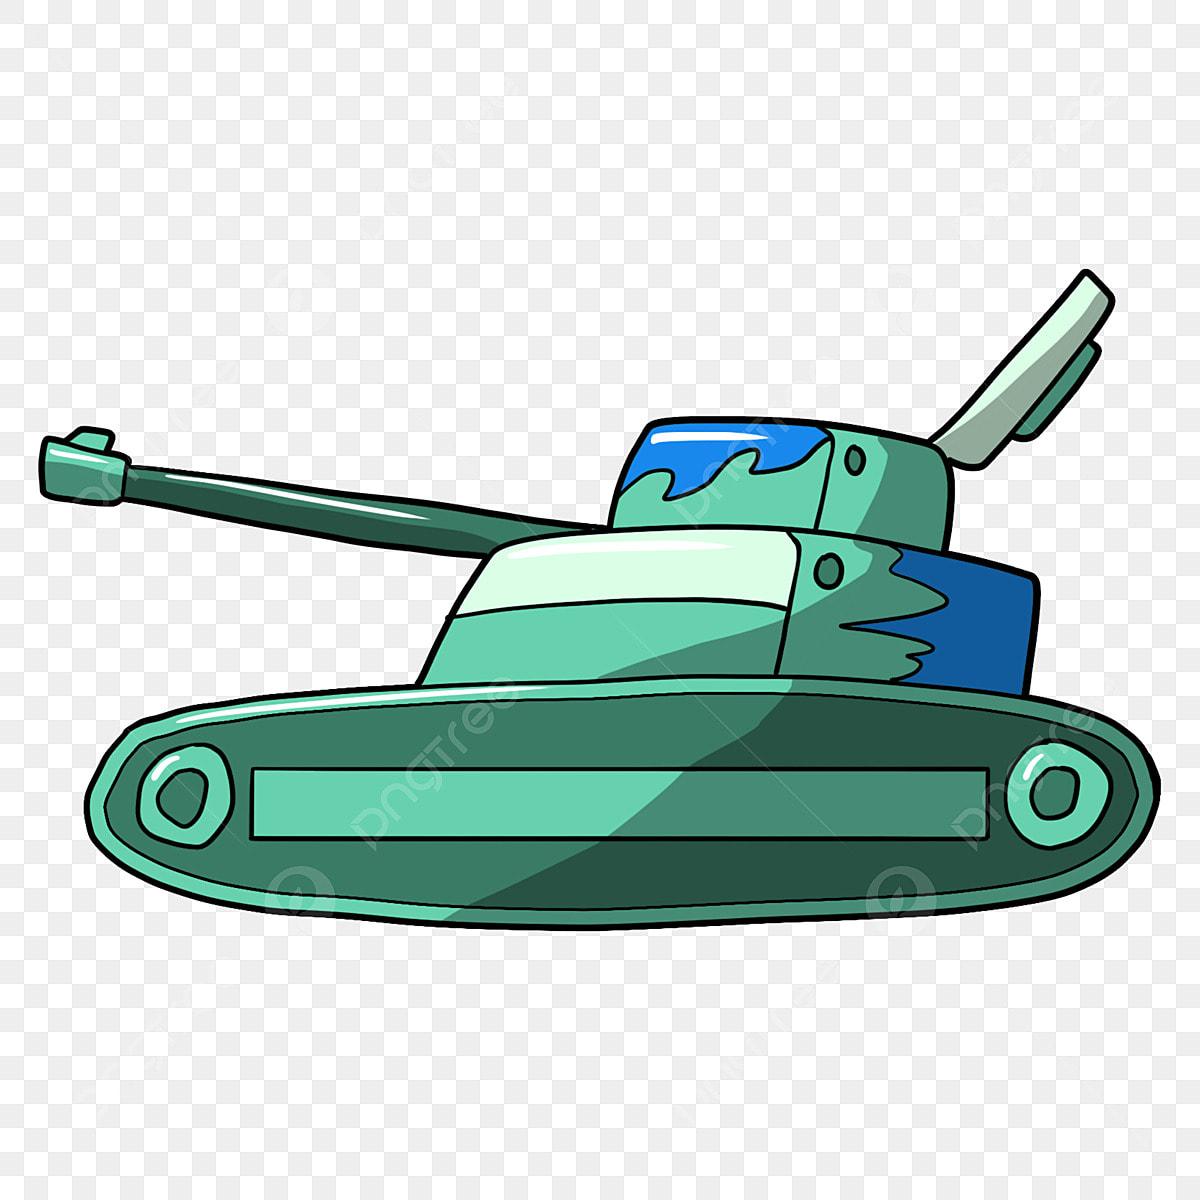 Army Day Green Cartoon Military, Cartoon, Combat, Hand Drawn